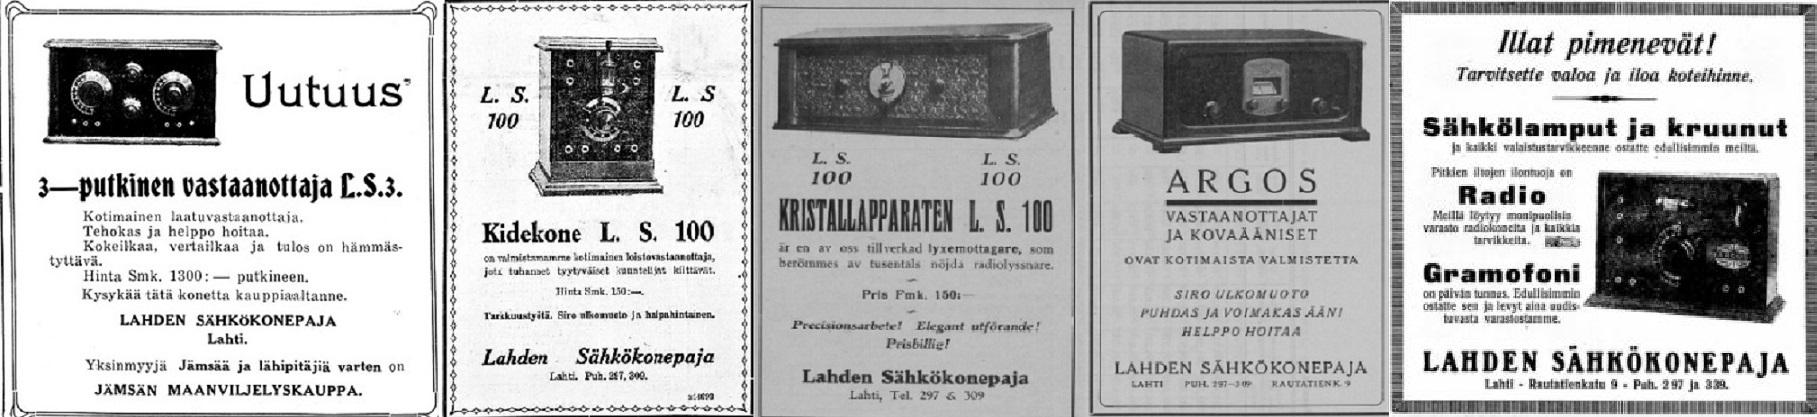 Lahden_Sdhkckonepaja_Vanha_Jdmsd_1928_no_40__HS_no_95_1928__Rundradion_nr_15_1928__Mercator_no_11_1930__Lahti_no_99_1929.jpg